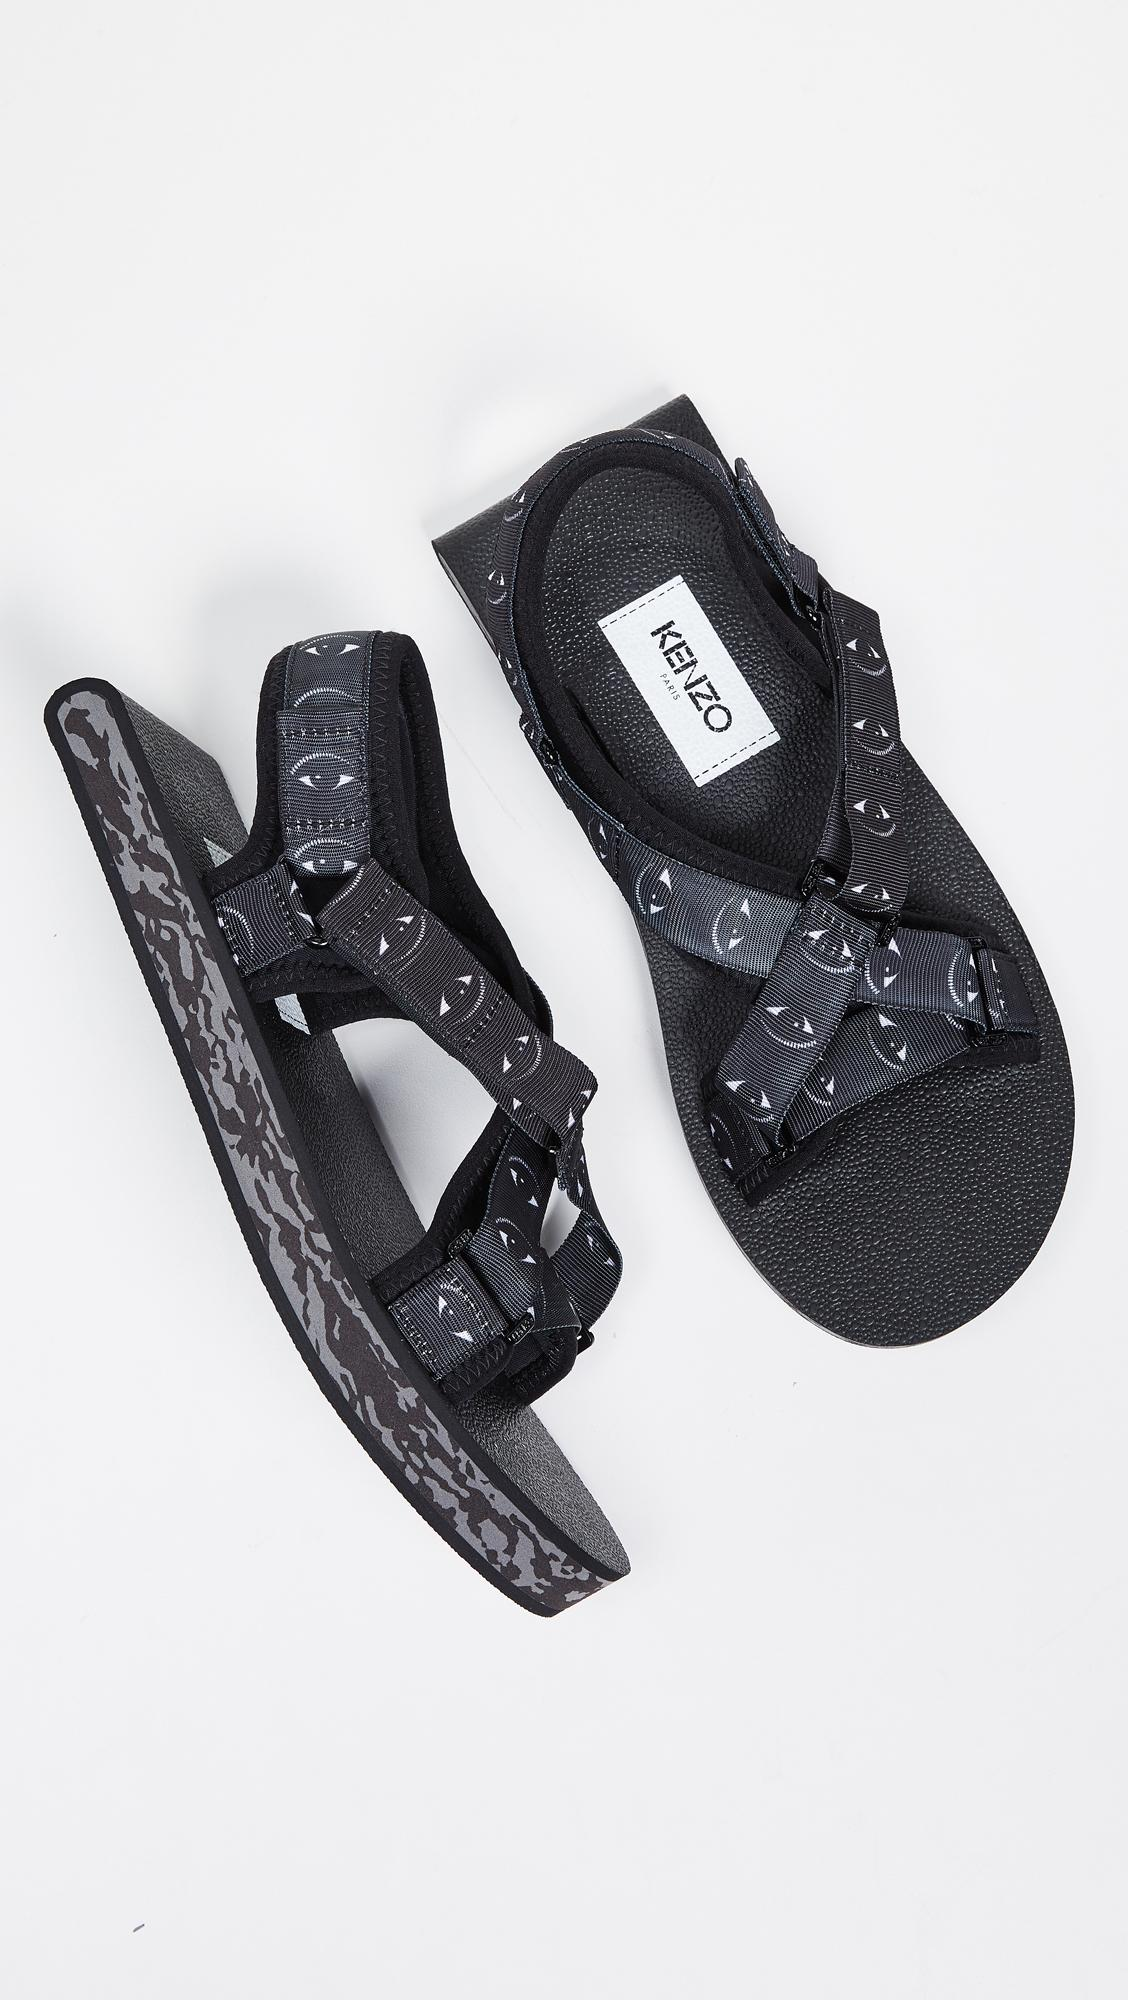 7686eb2fadf2 KENZO Lynn Flat Sandals in Black for Men - Lyst